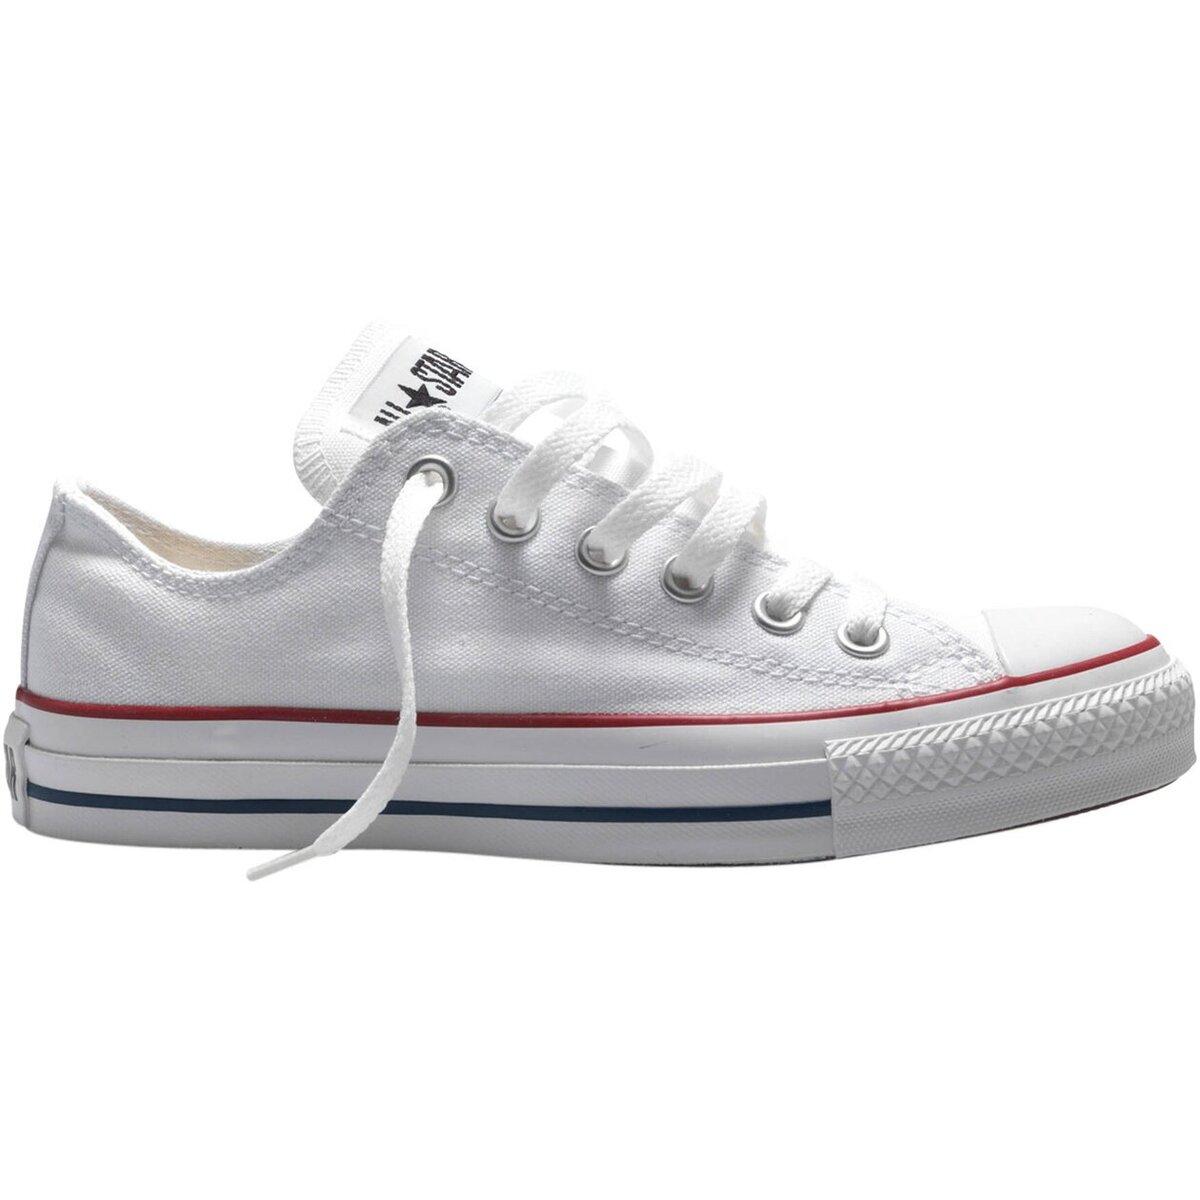 Bild 1 von CONVERSE Sneaker AS Core OX - optical white